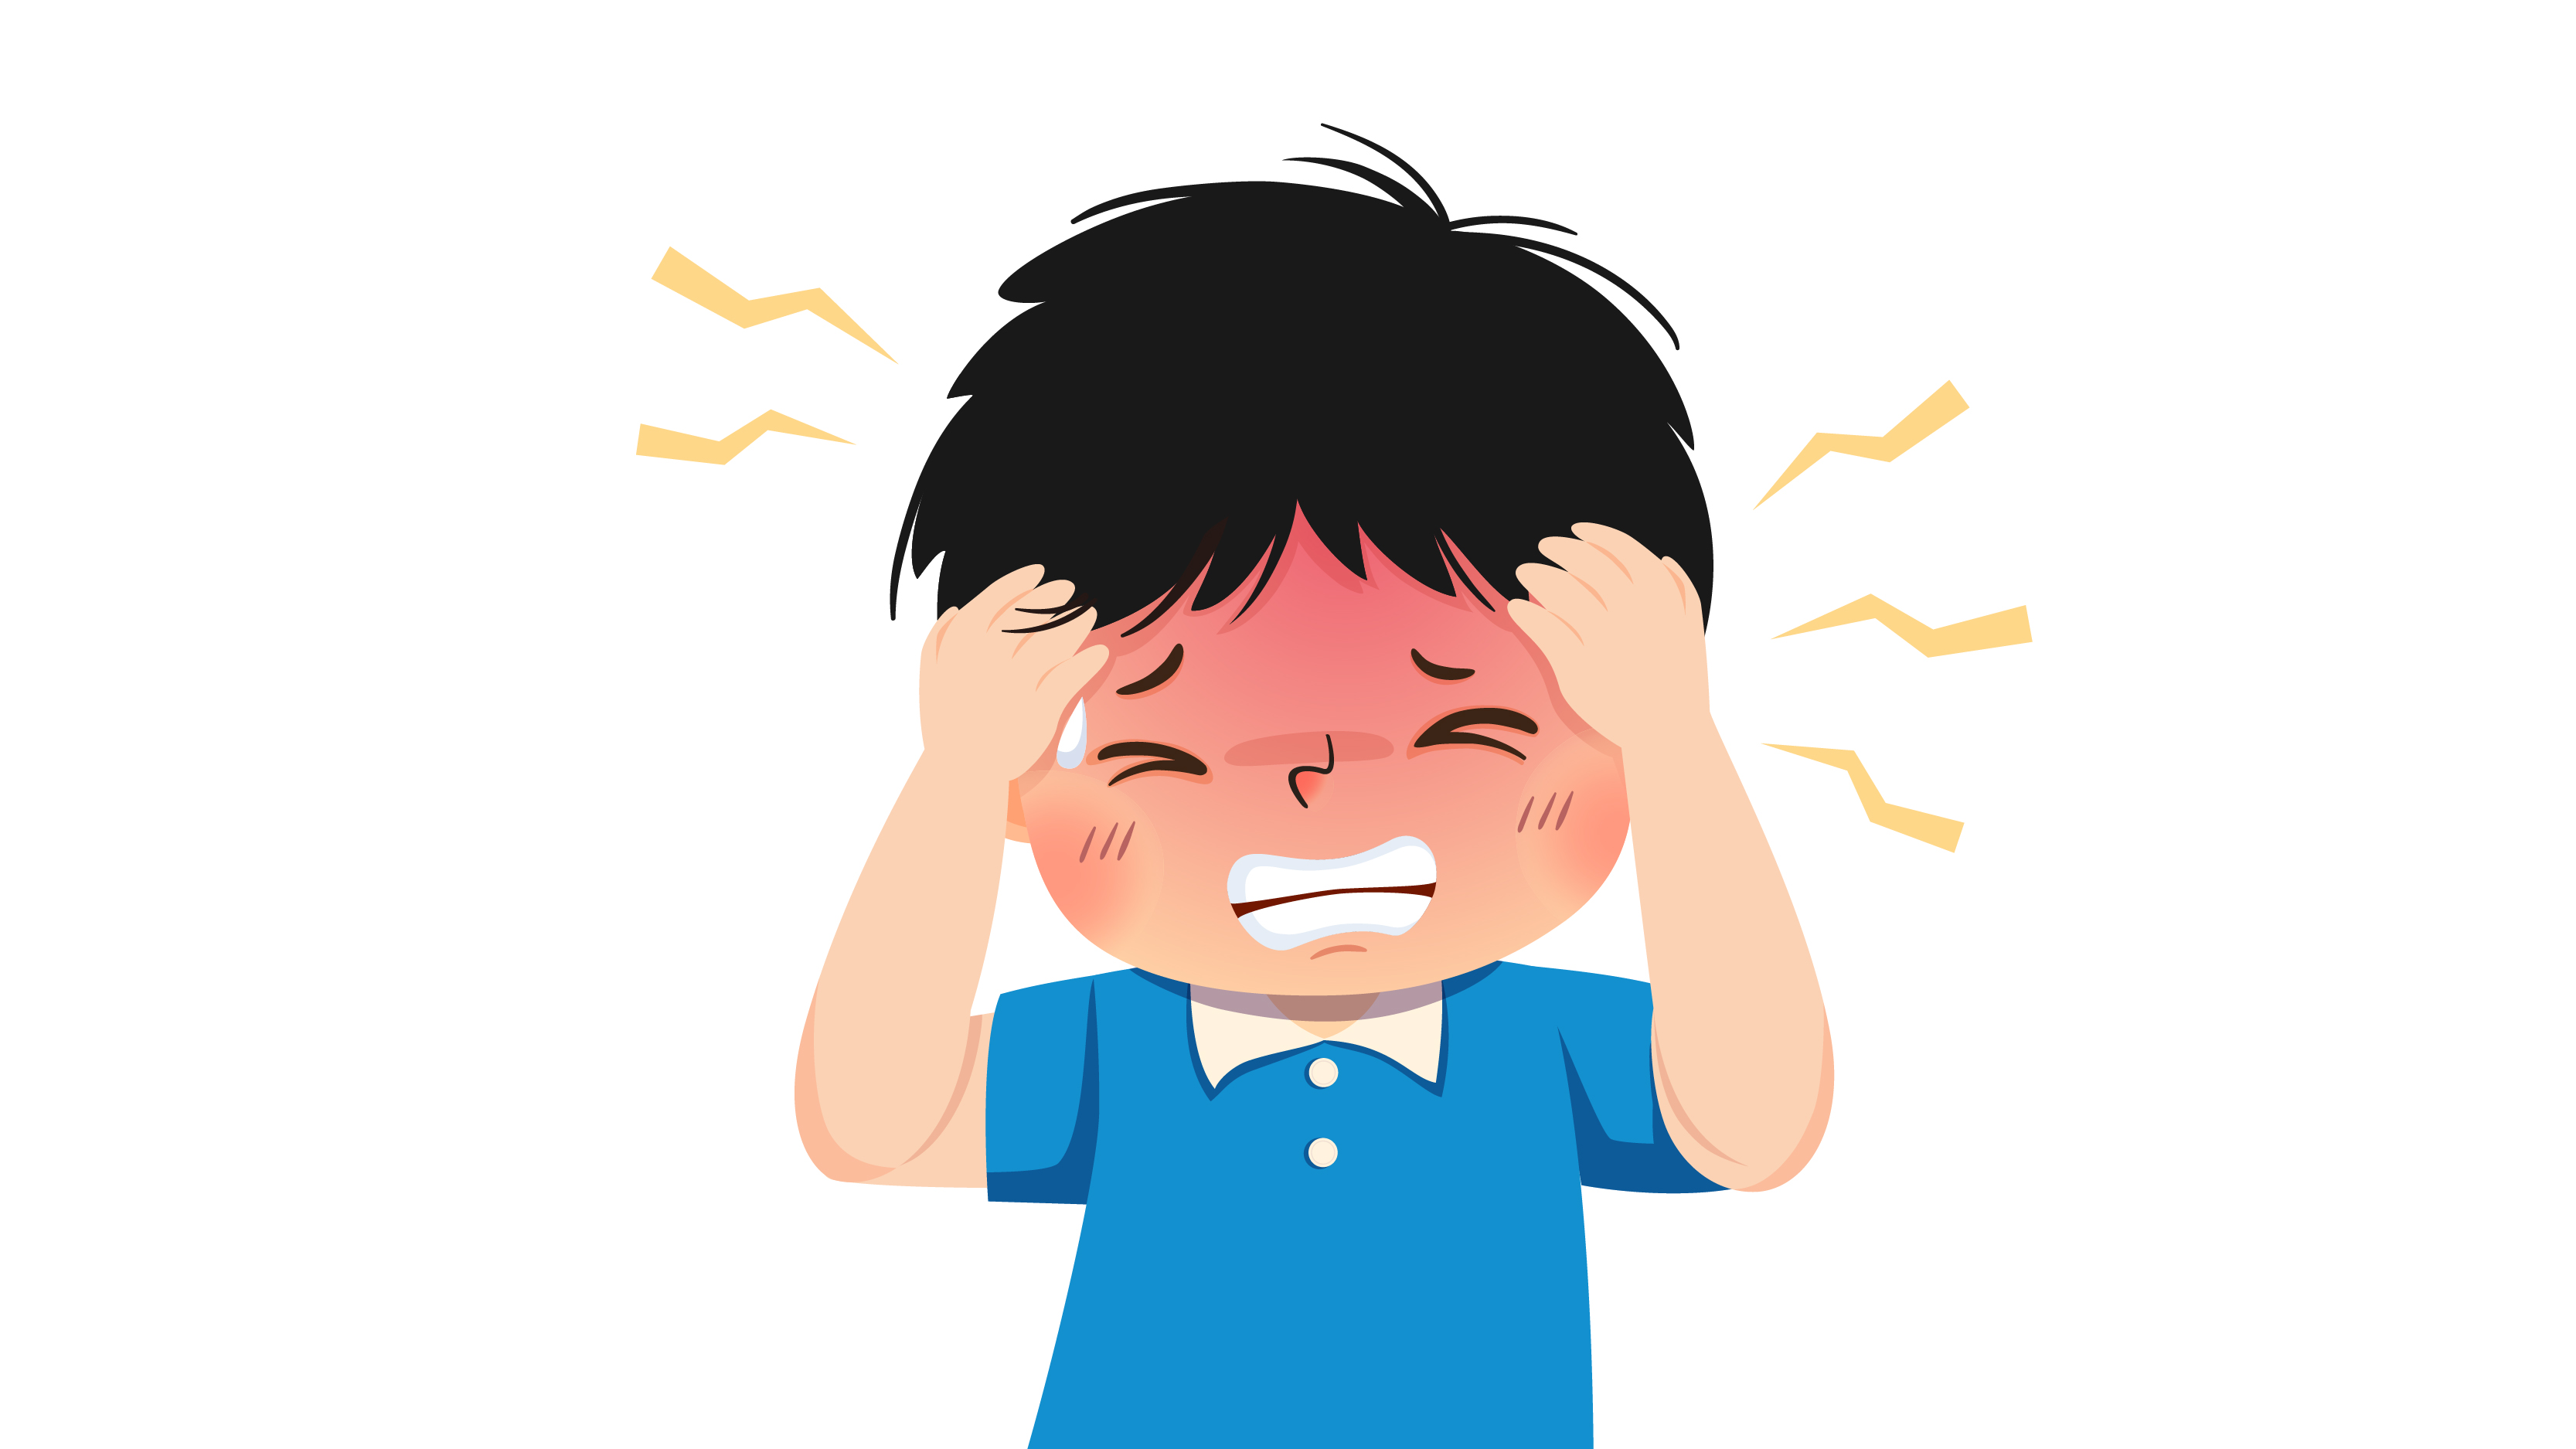 Terlalu Sensitif atau Sensory Proccesing Disorder?